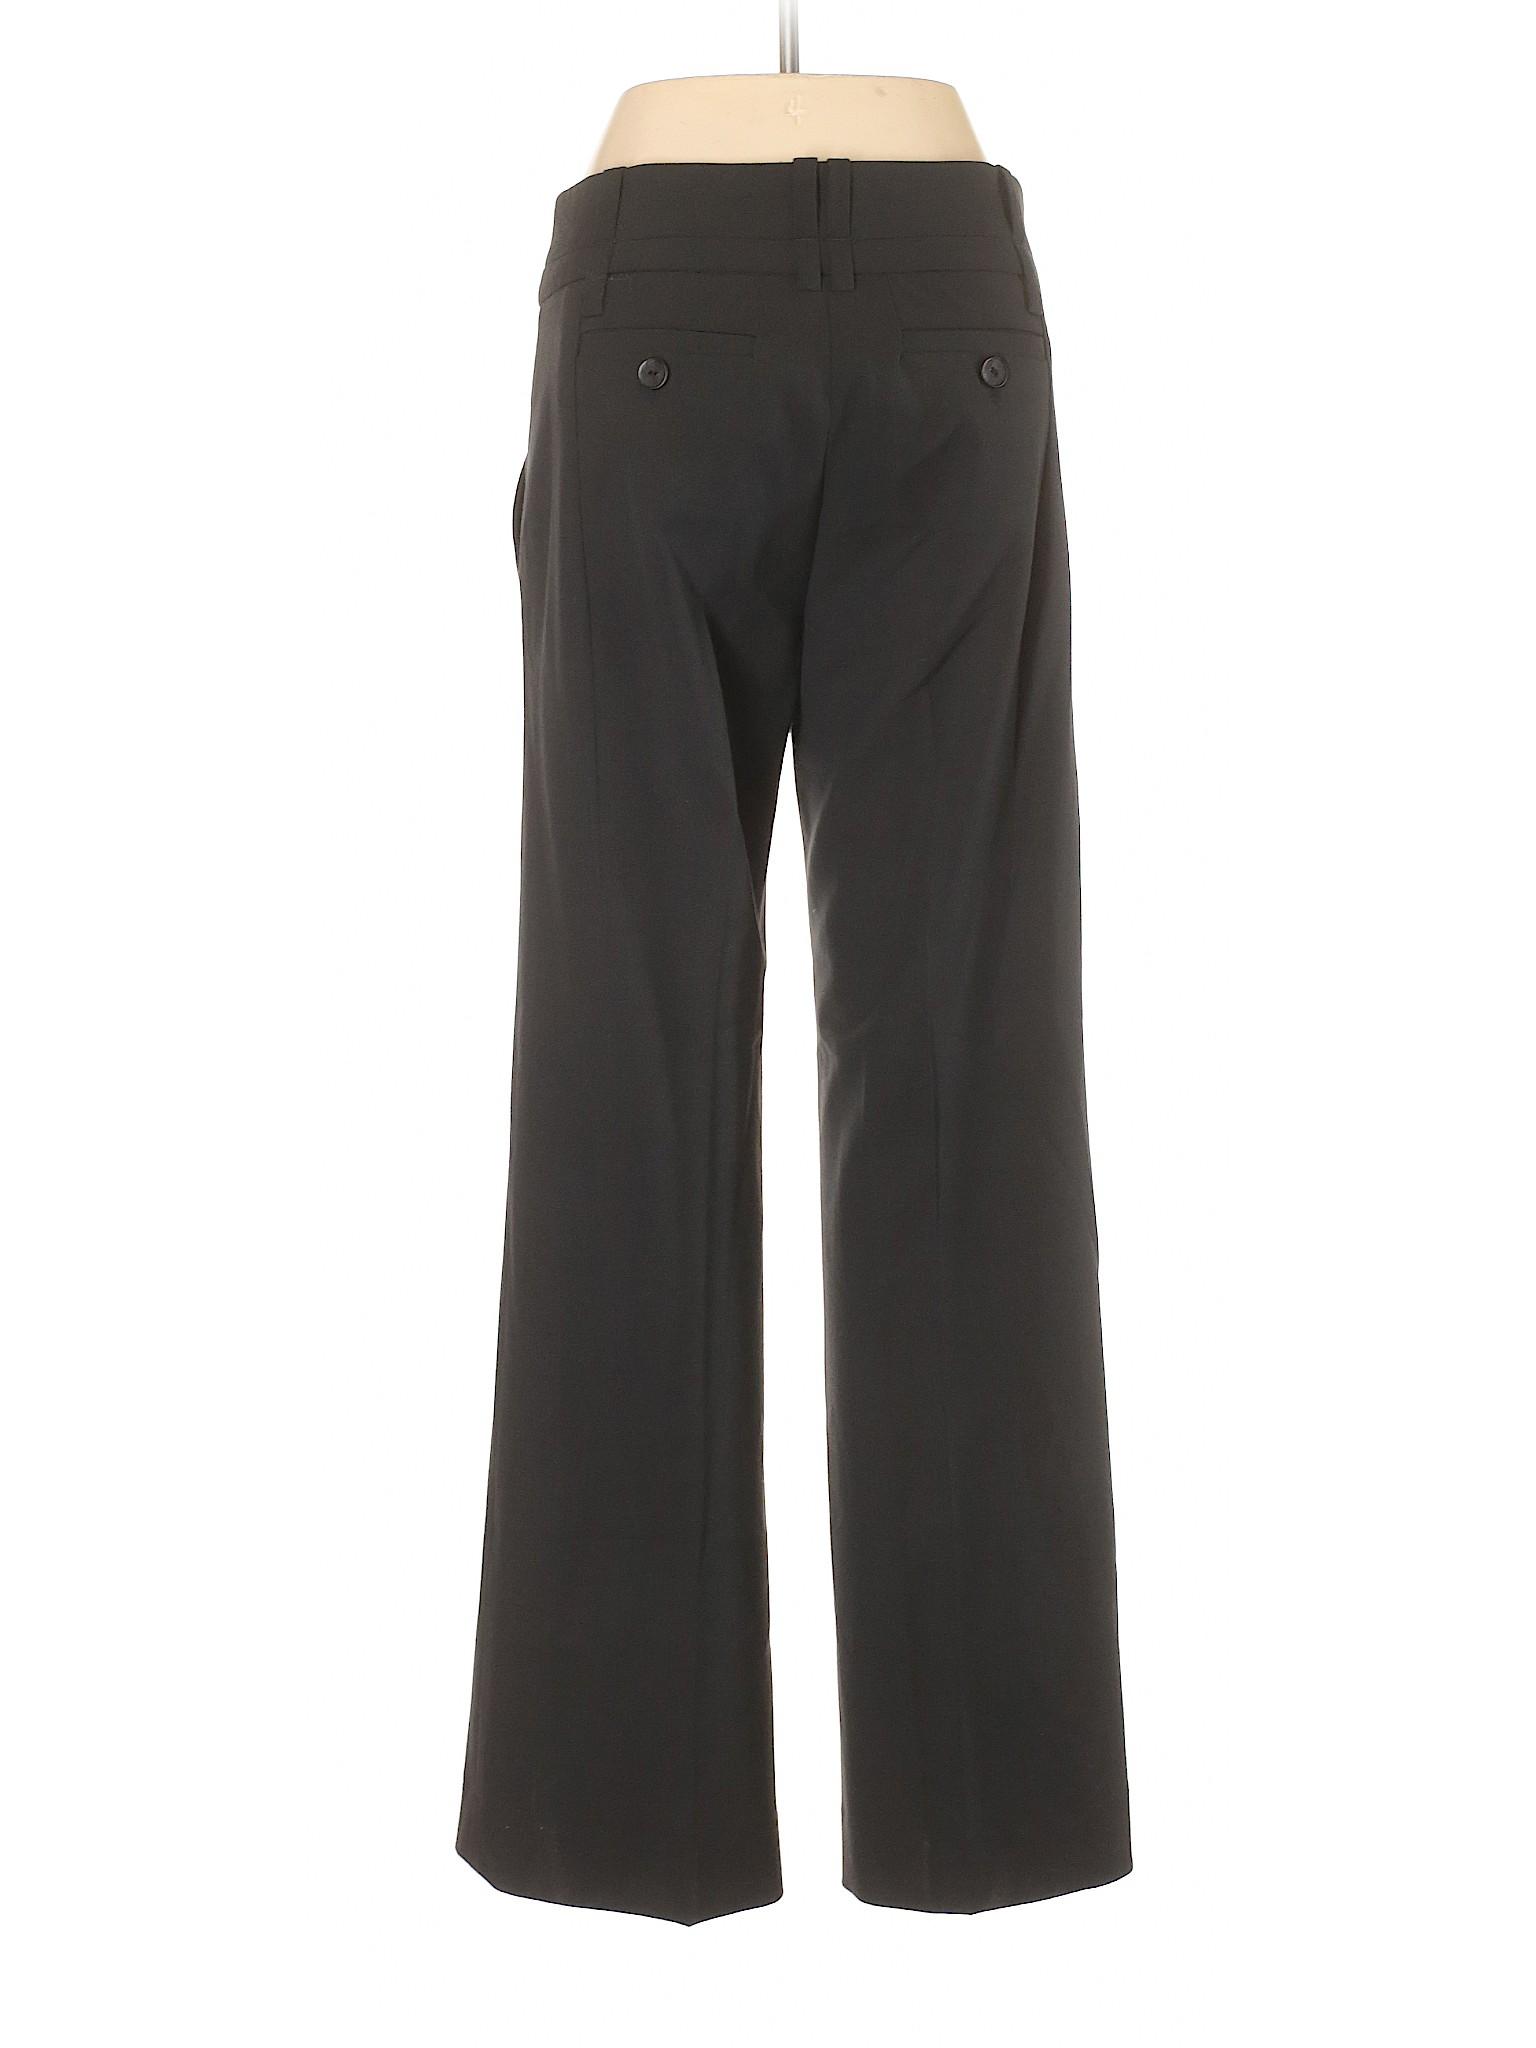 Boutique Pants winter Rodriguez Dress Robert RPR0qr